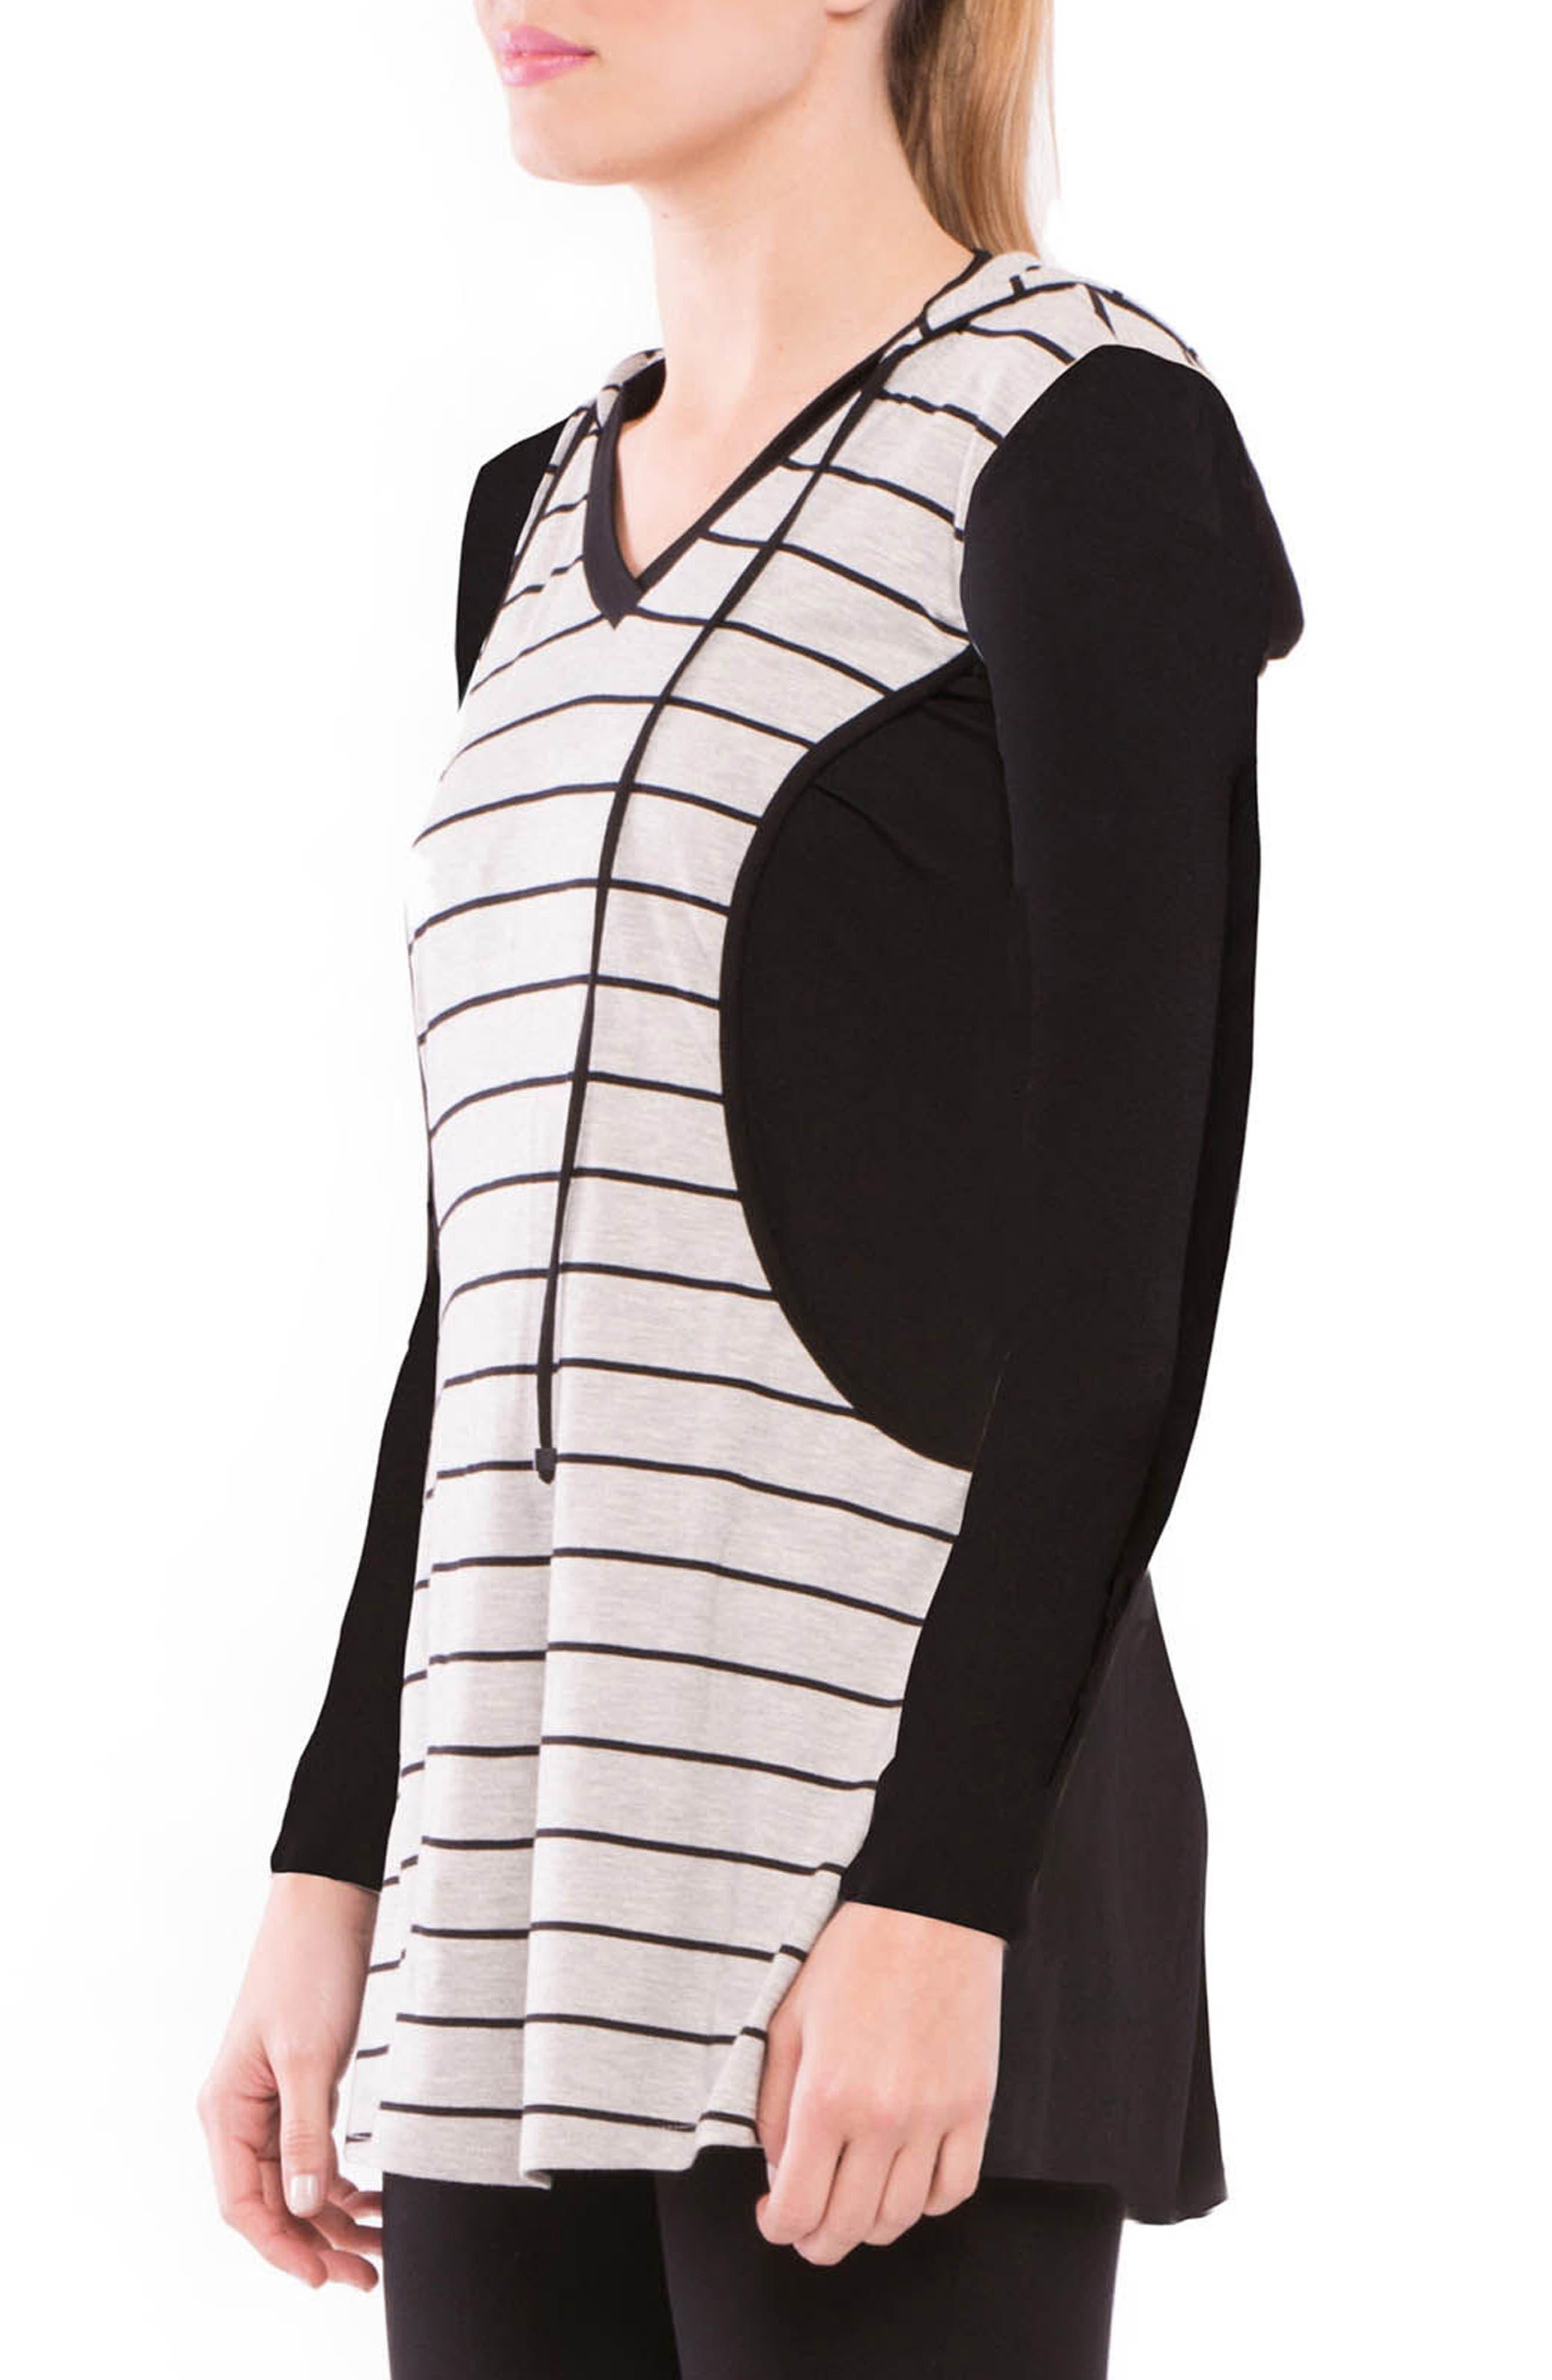 Skye Maternity/Nursing Hooded Tunic,                             Alternate thumbnail 4, color,                             GRAY/ BLACK STRIPE